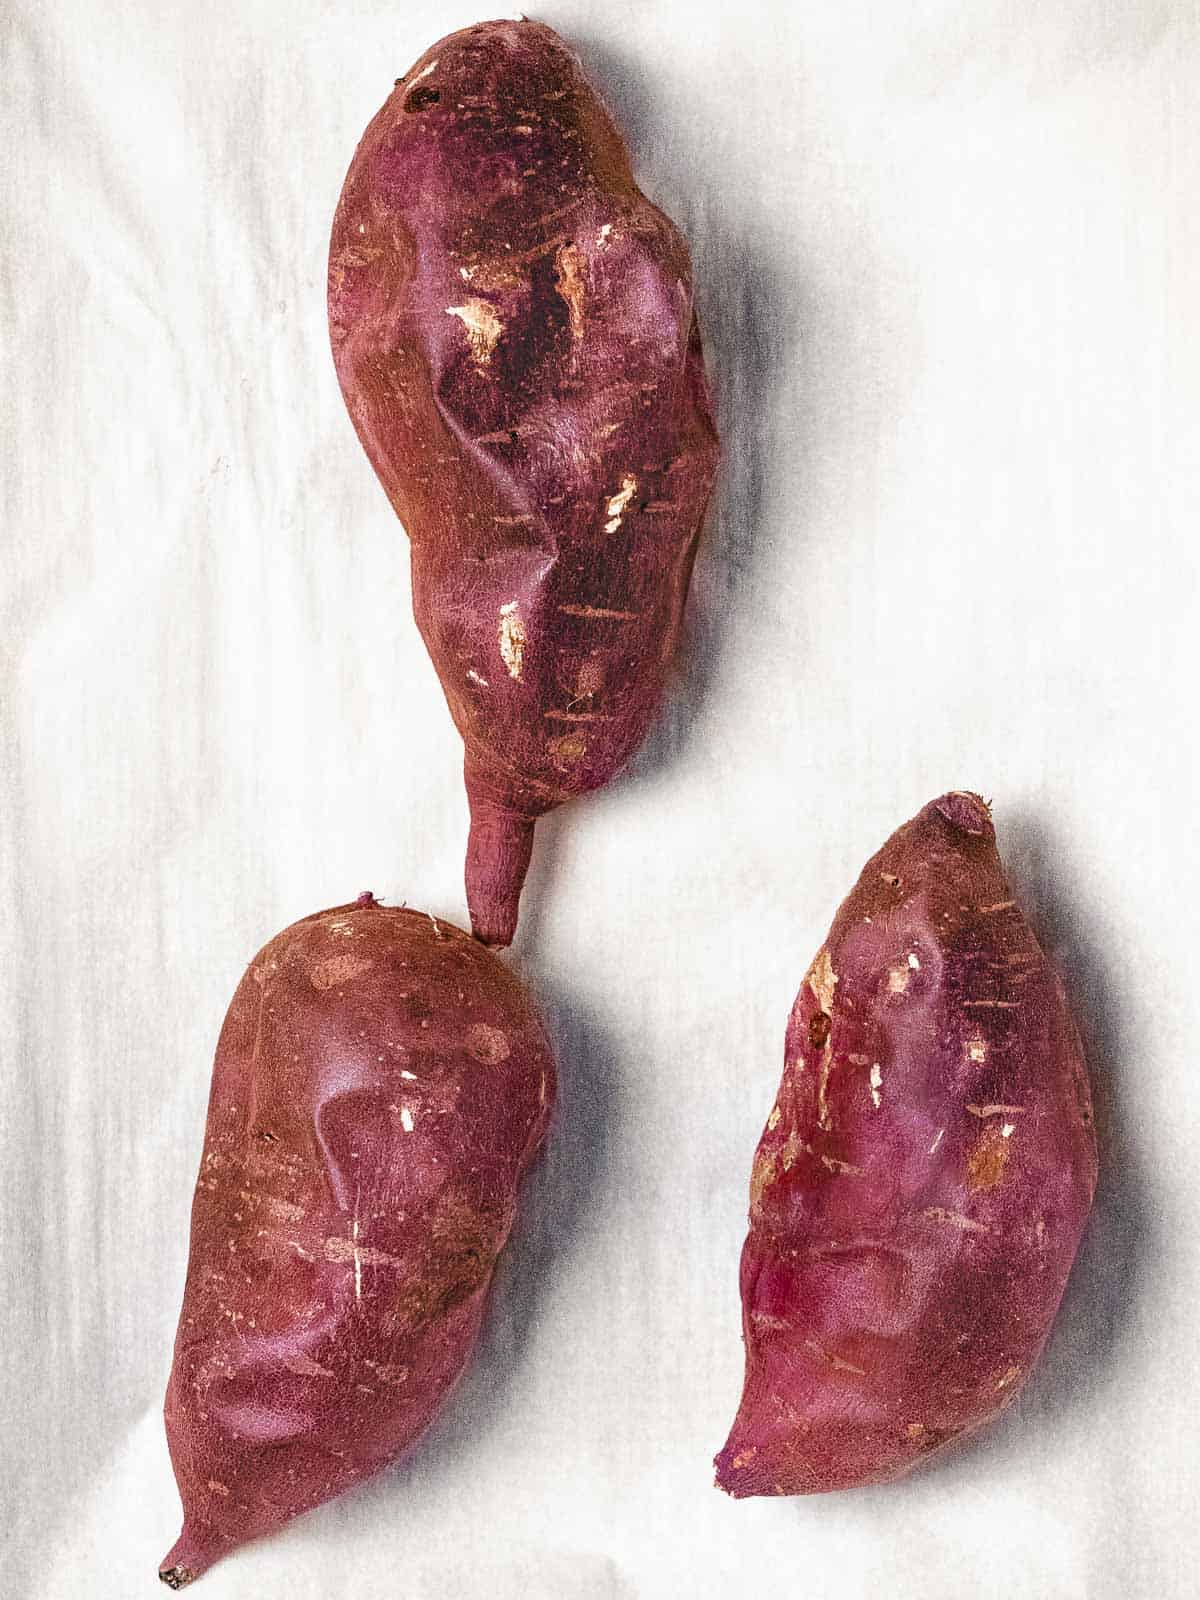 Roasted Korean sweet potatoes (Gungoguma 군고구마) with wrinkled purple skin.